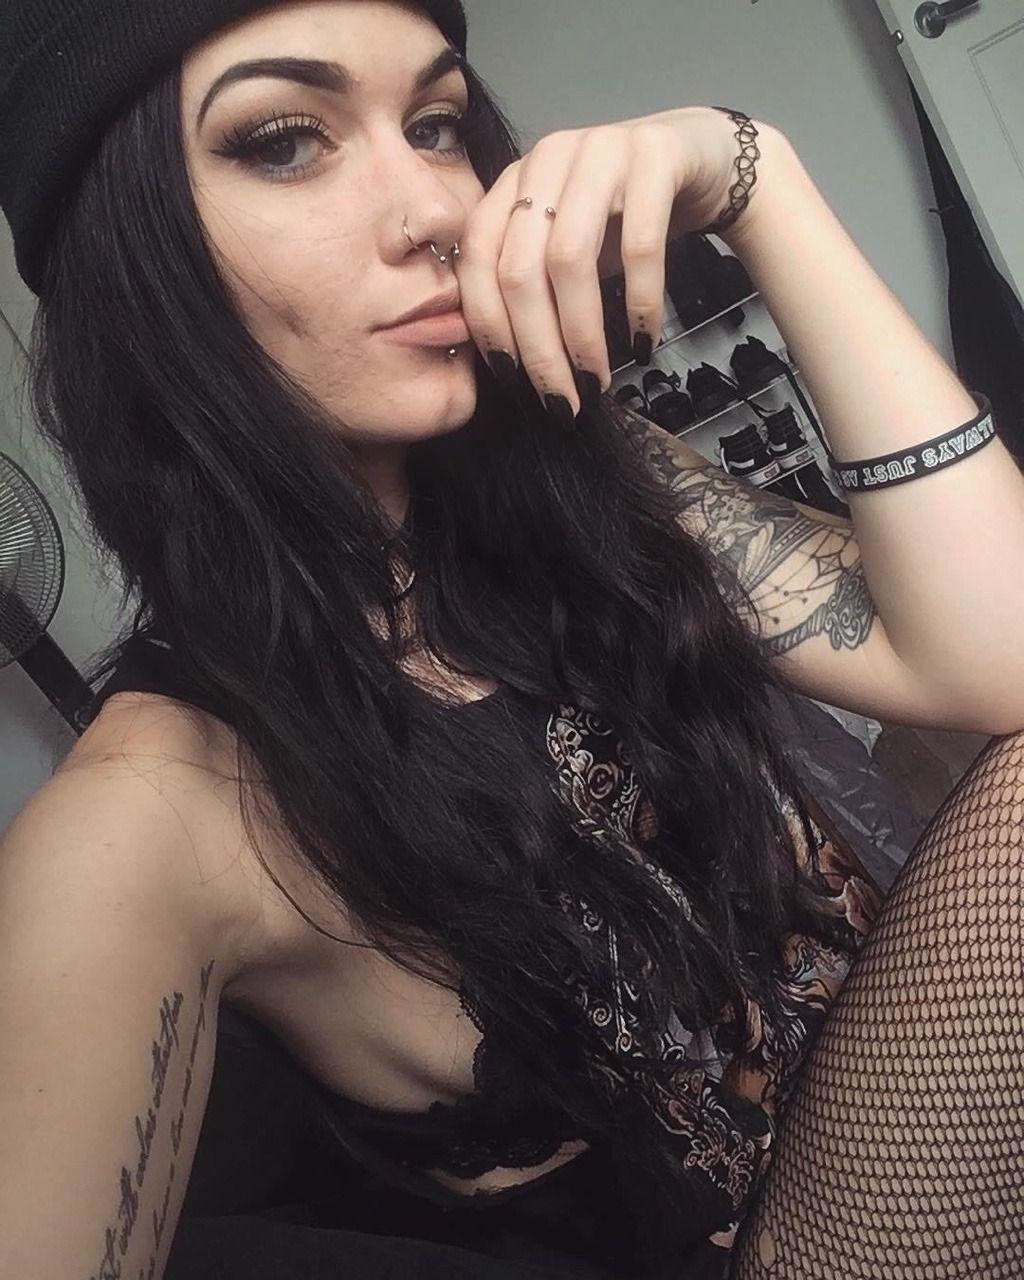 Piercings black hair small tits